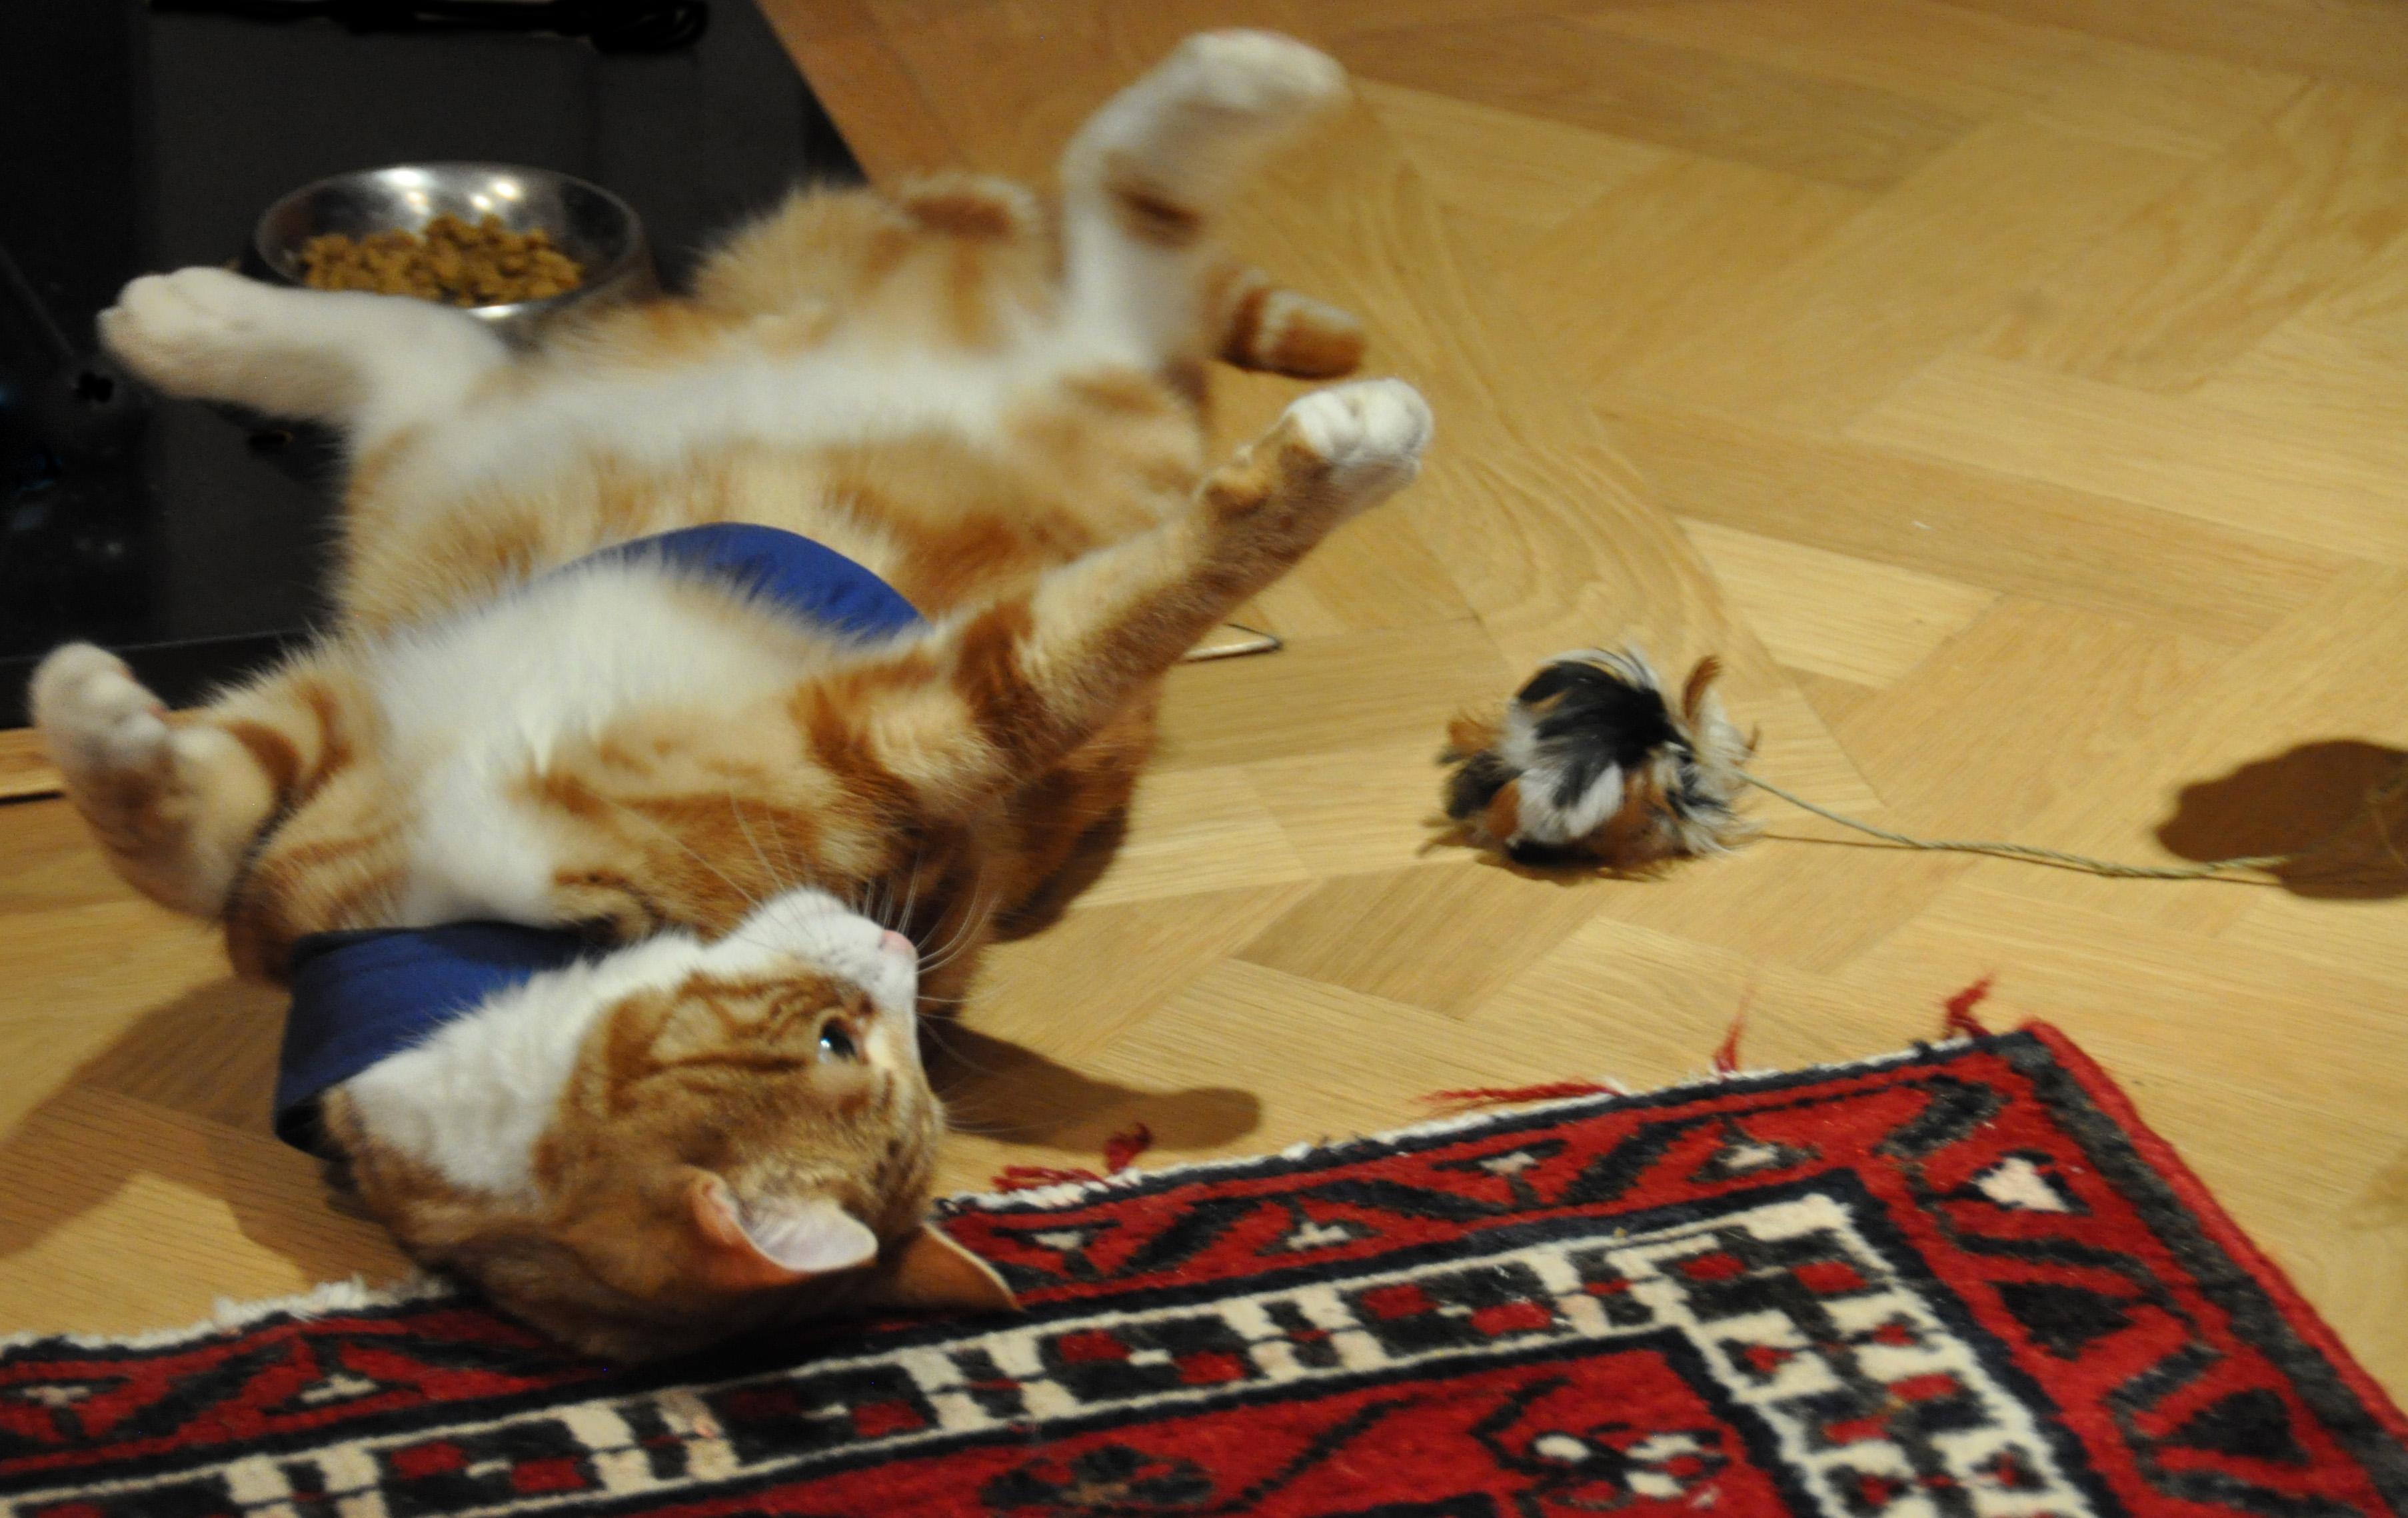 Ginger Tom - no shame